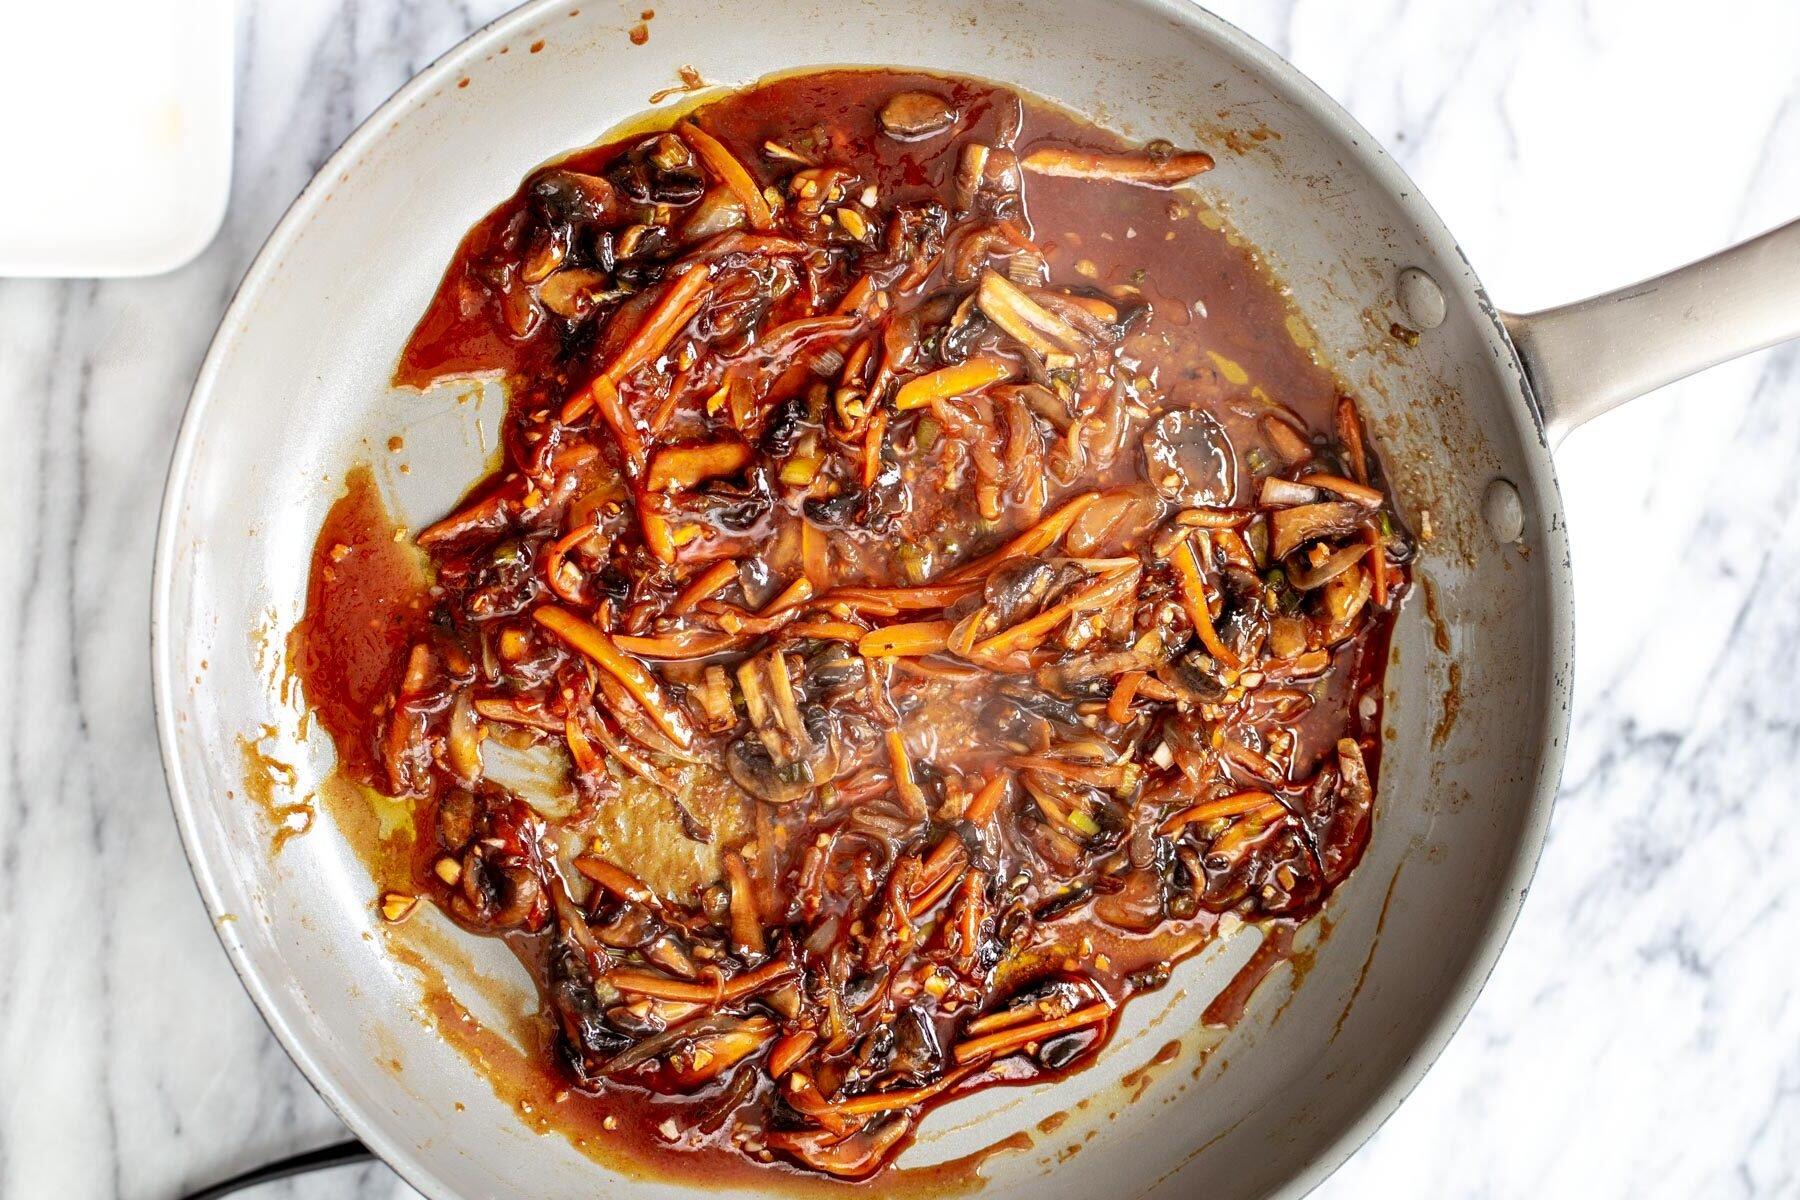 veggies in a saucepan simmering with sauce ingredients